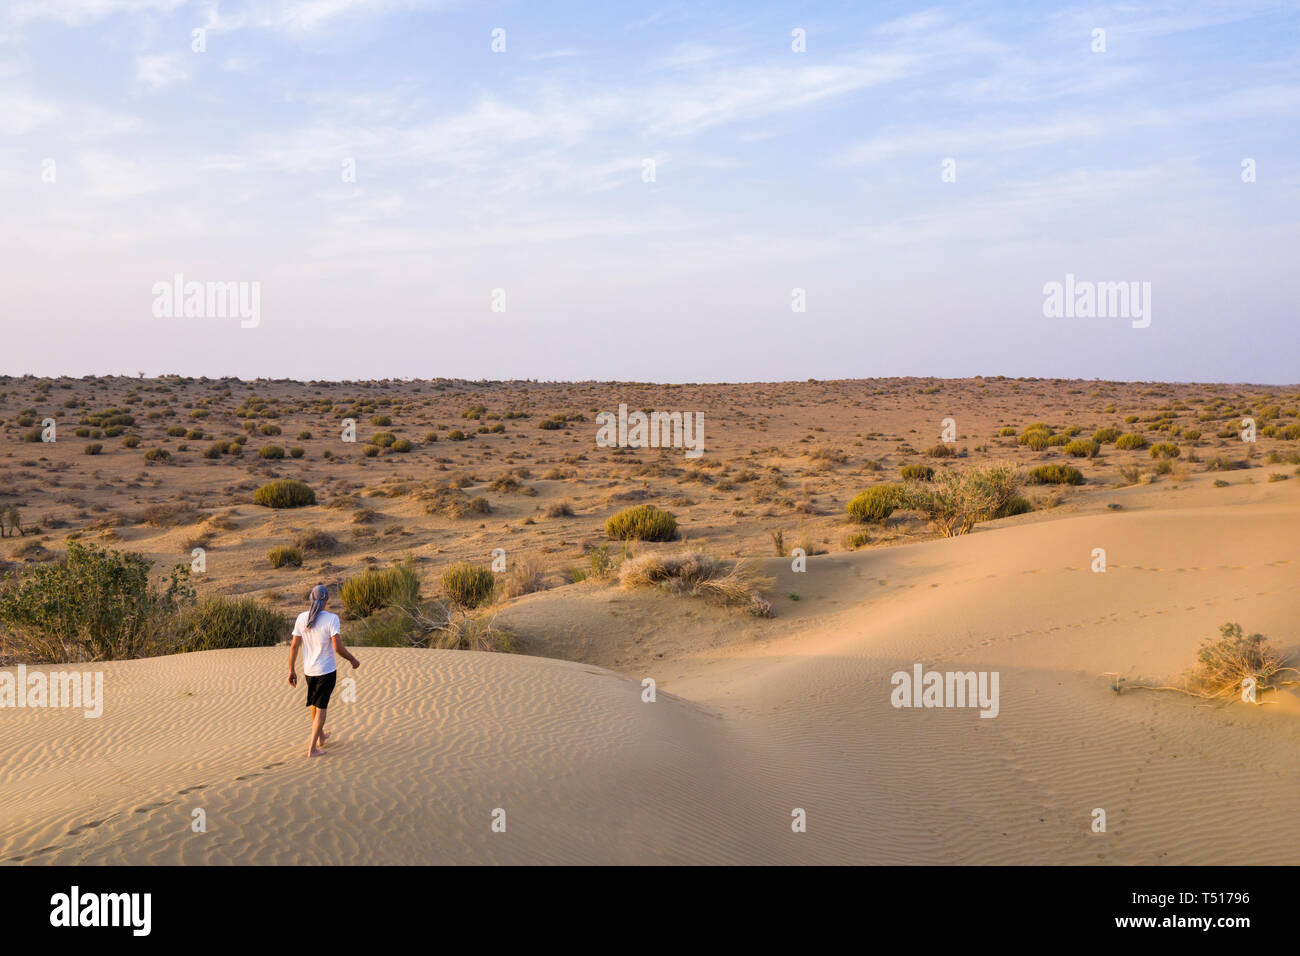 India, Rajasthan, Jaisalmer, Khuri Desert (MR) - Stock Image